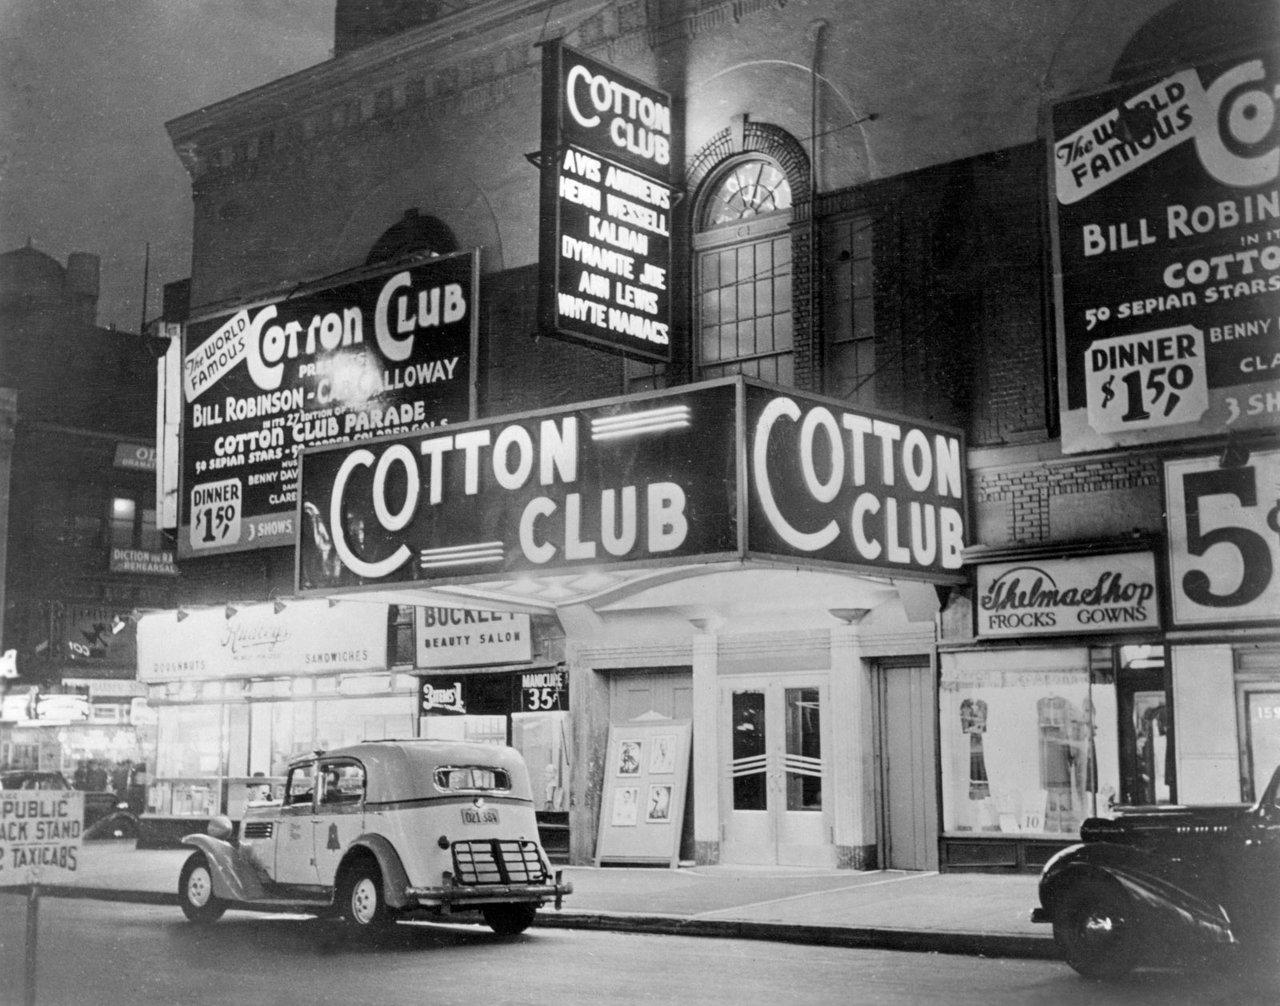 cotton club photo